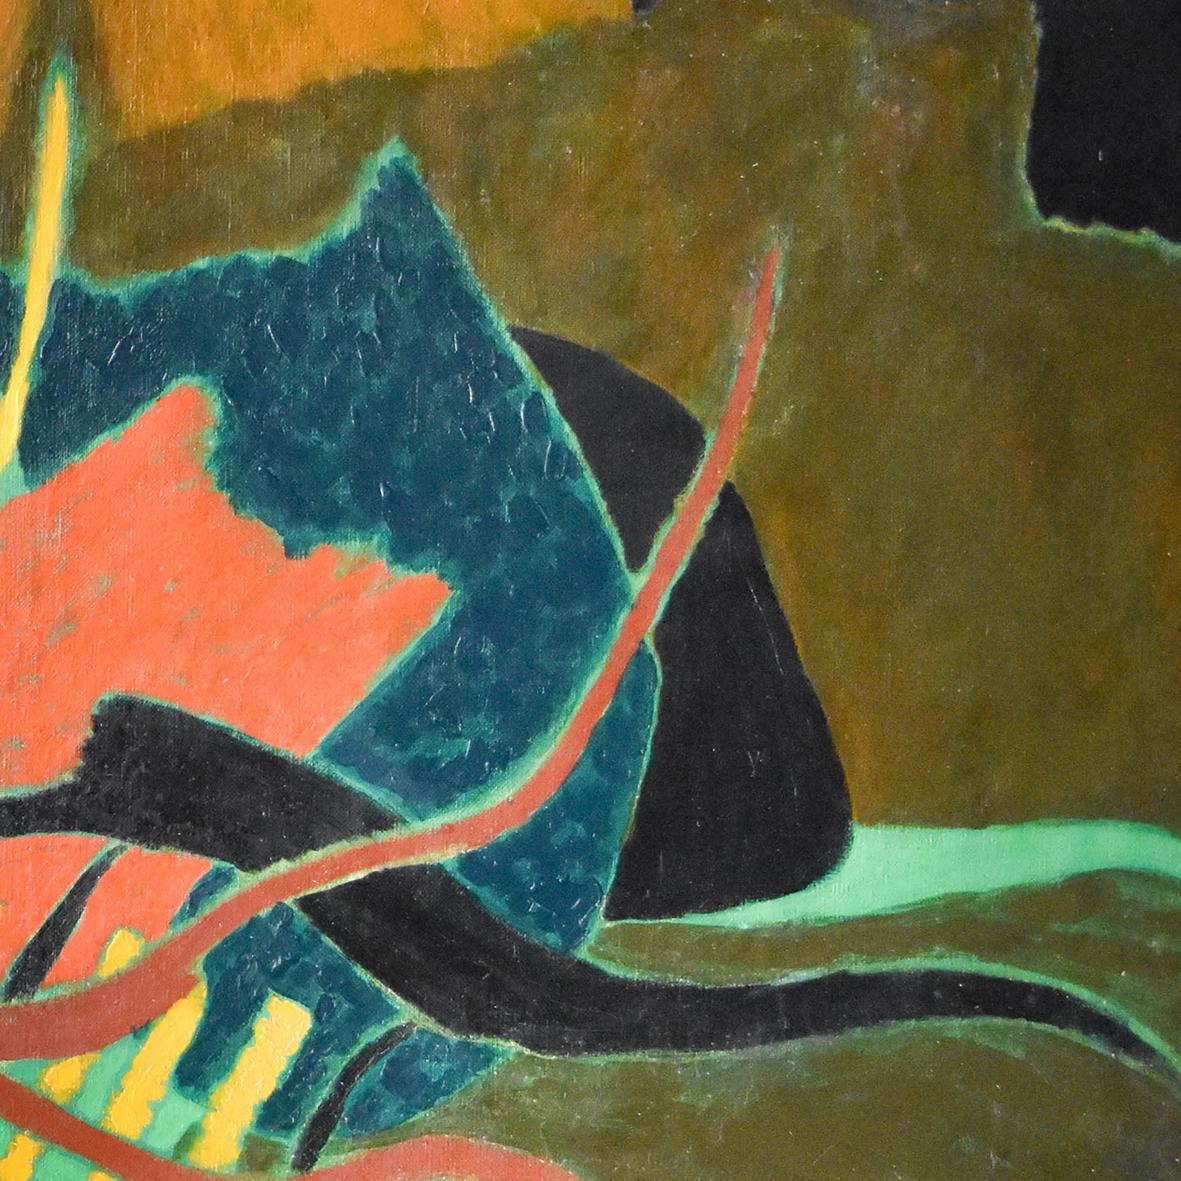 Nashar, Vines, oil on canvas, 64 x 92.5 cm, 1984 (detail)